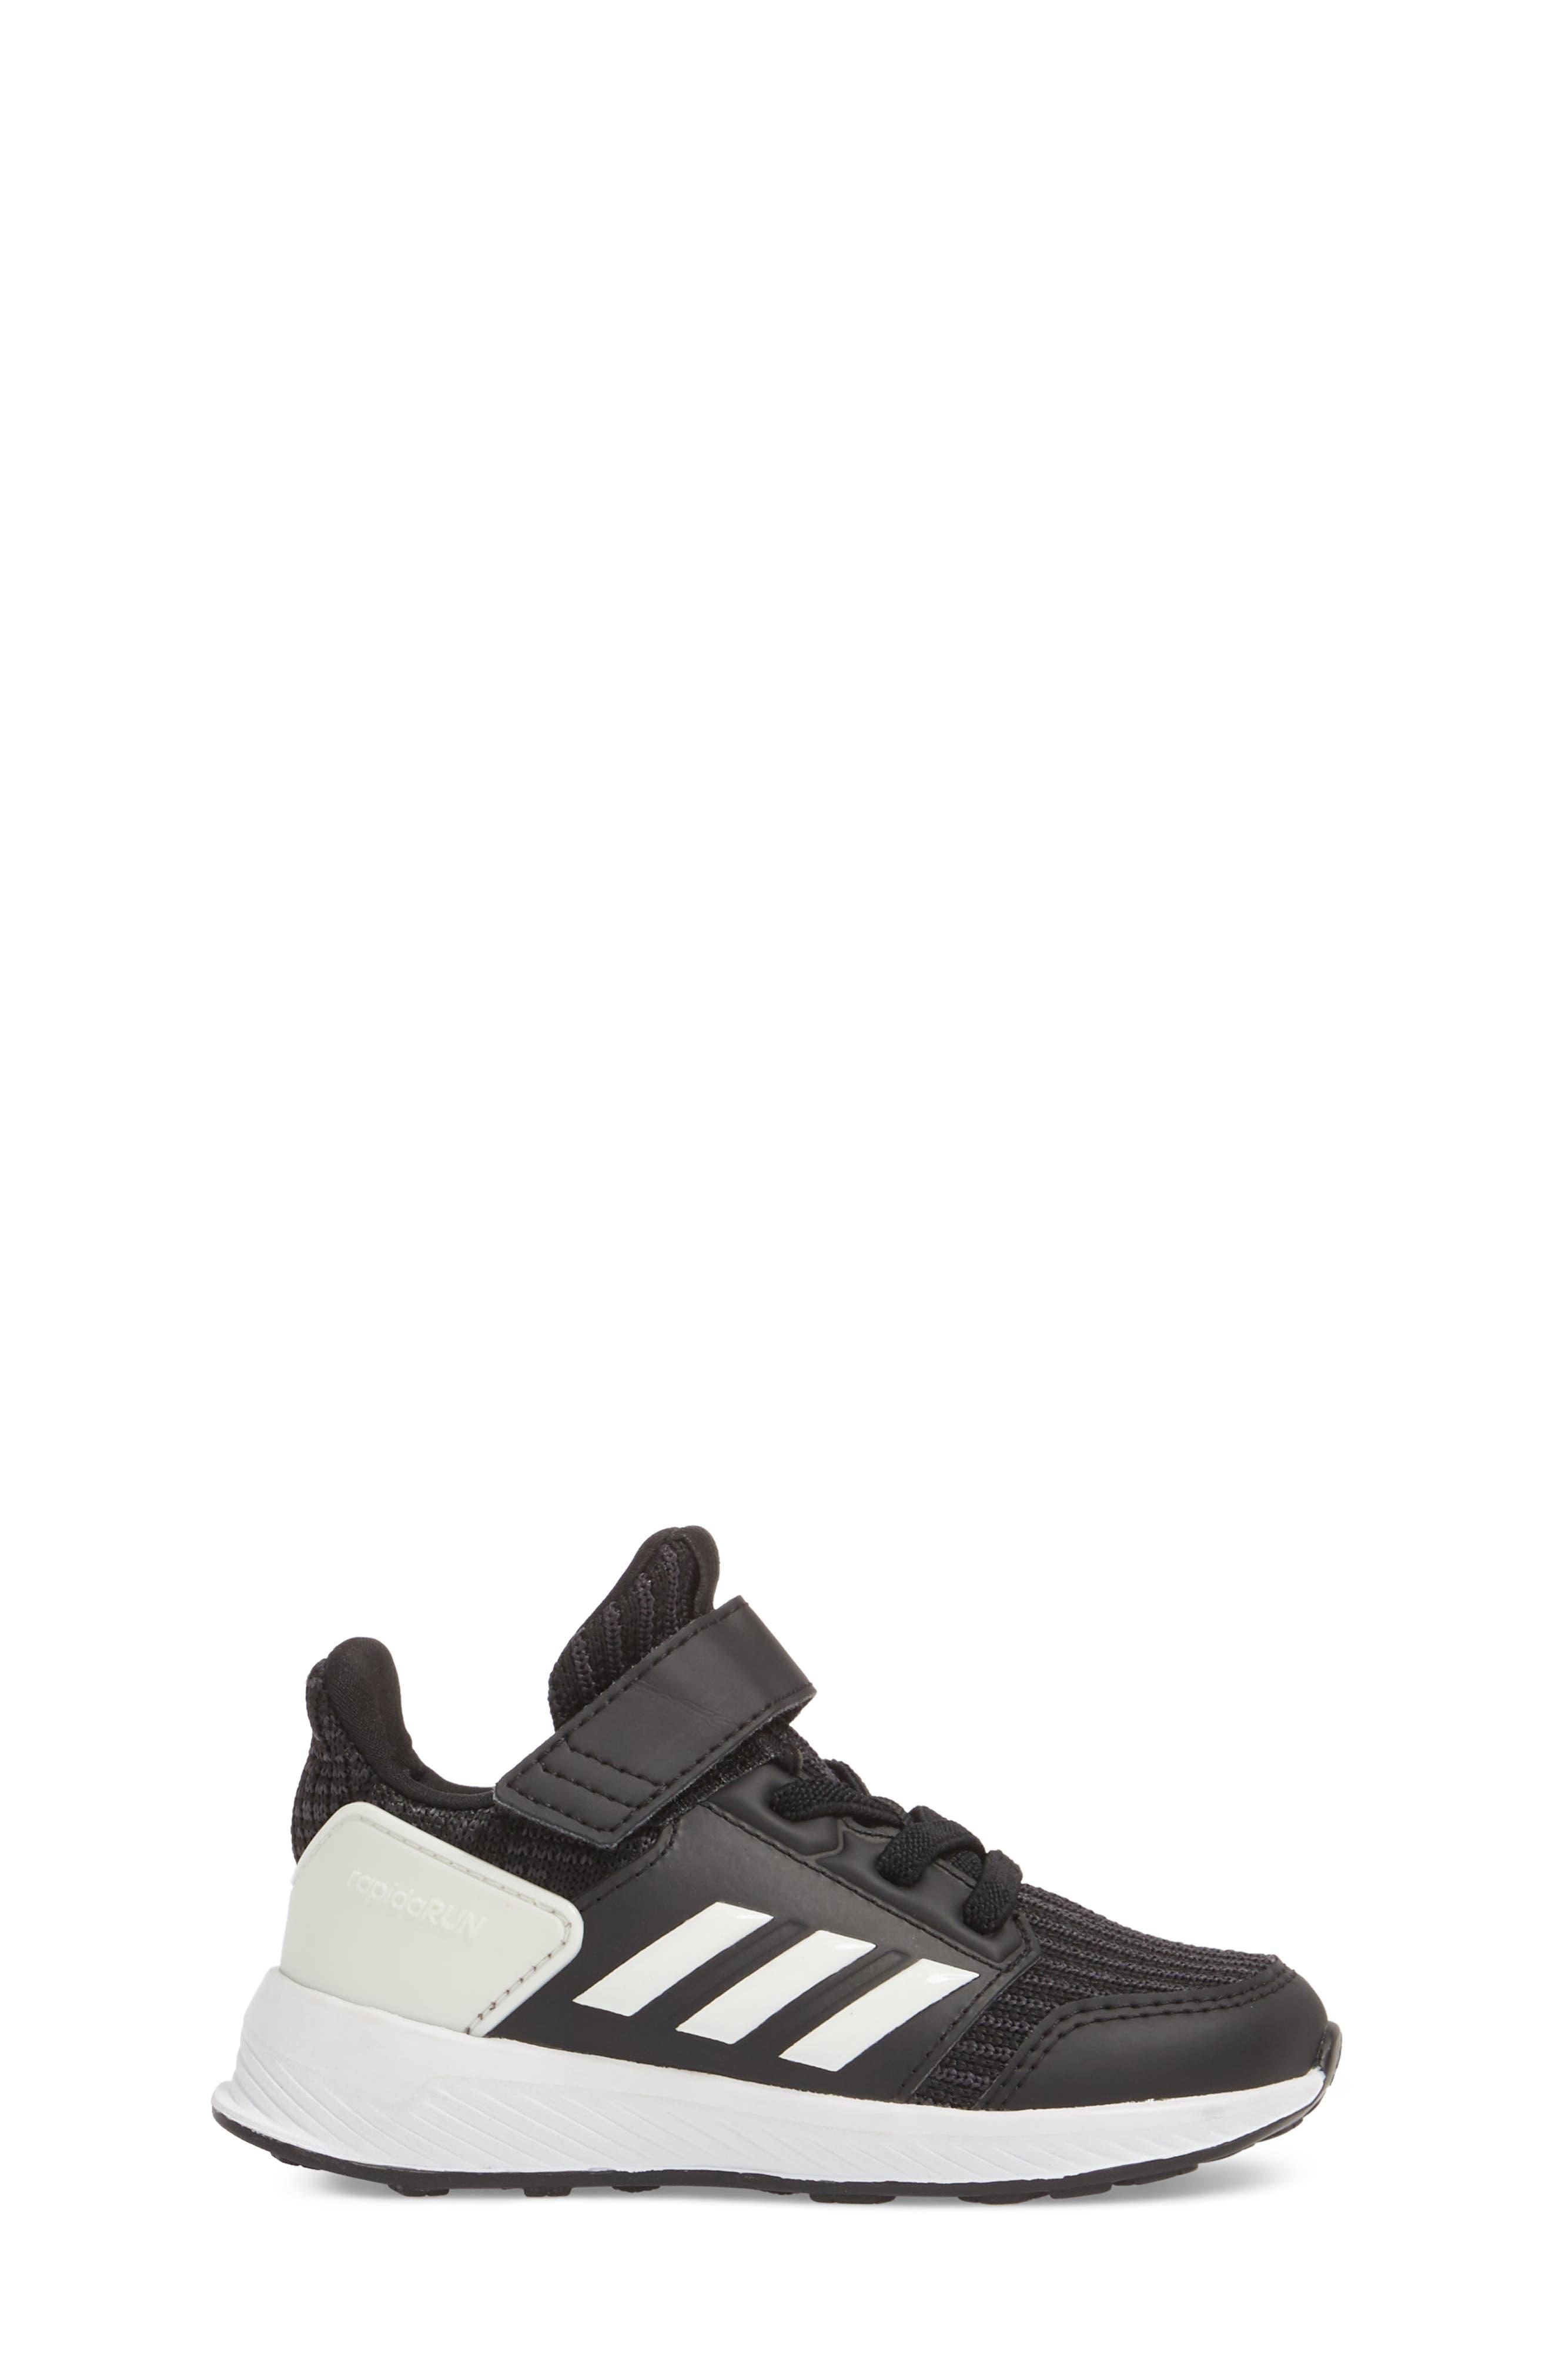 RapidaRun Knit Sneaker,                             Alternate thumbnail 3, color,                             BLACK/ WHITE